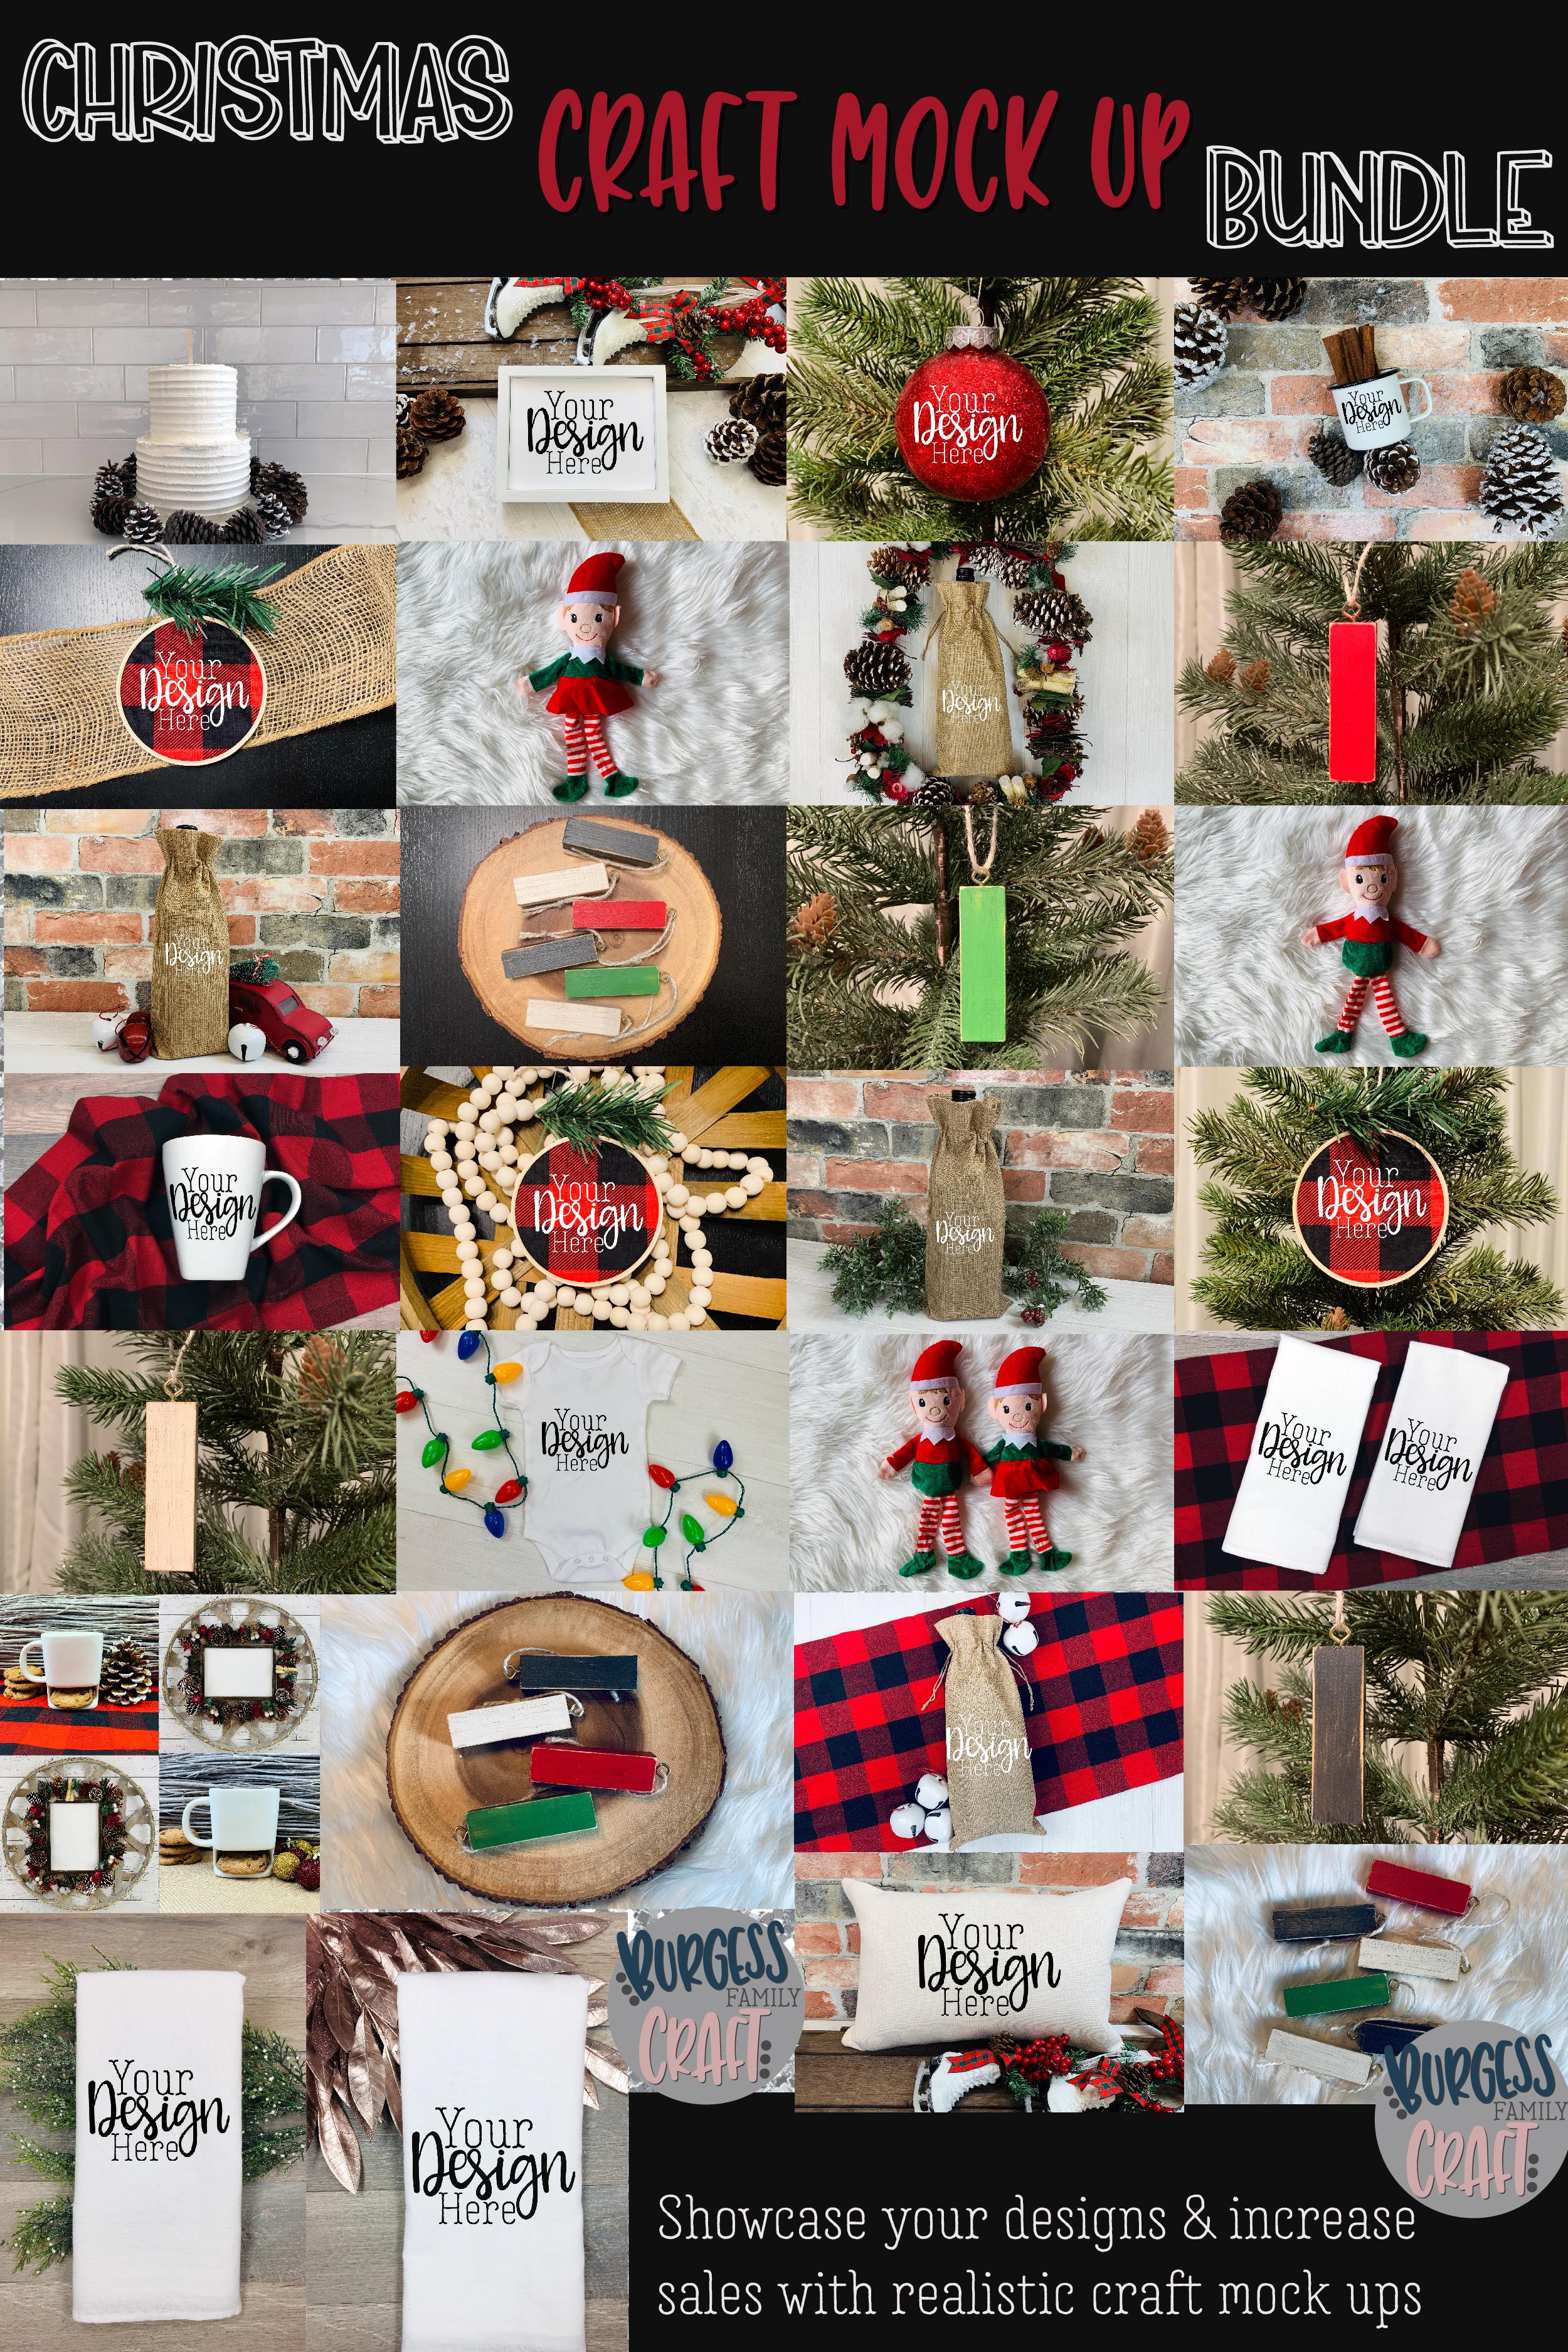 Christmas craft mock up bundle  High Res JPEG example image 2